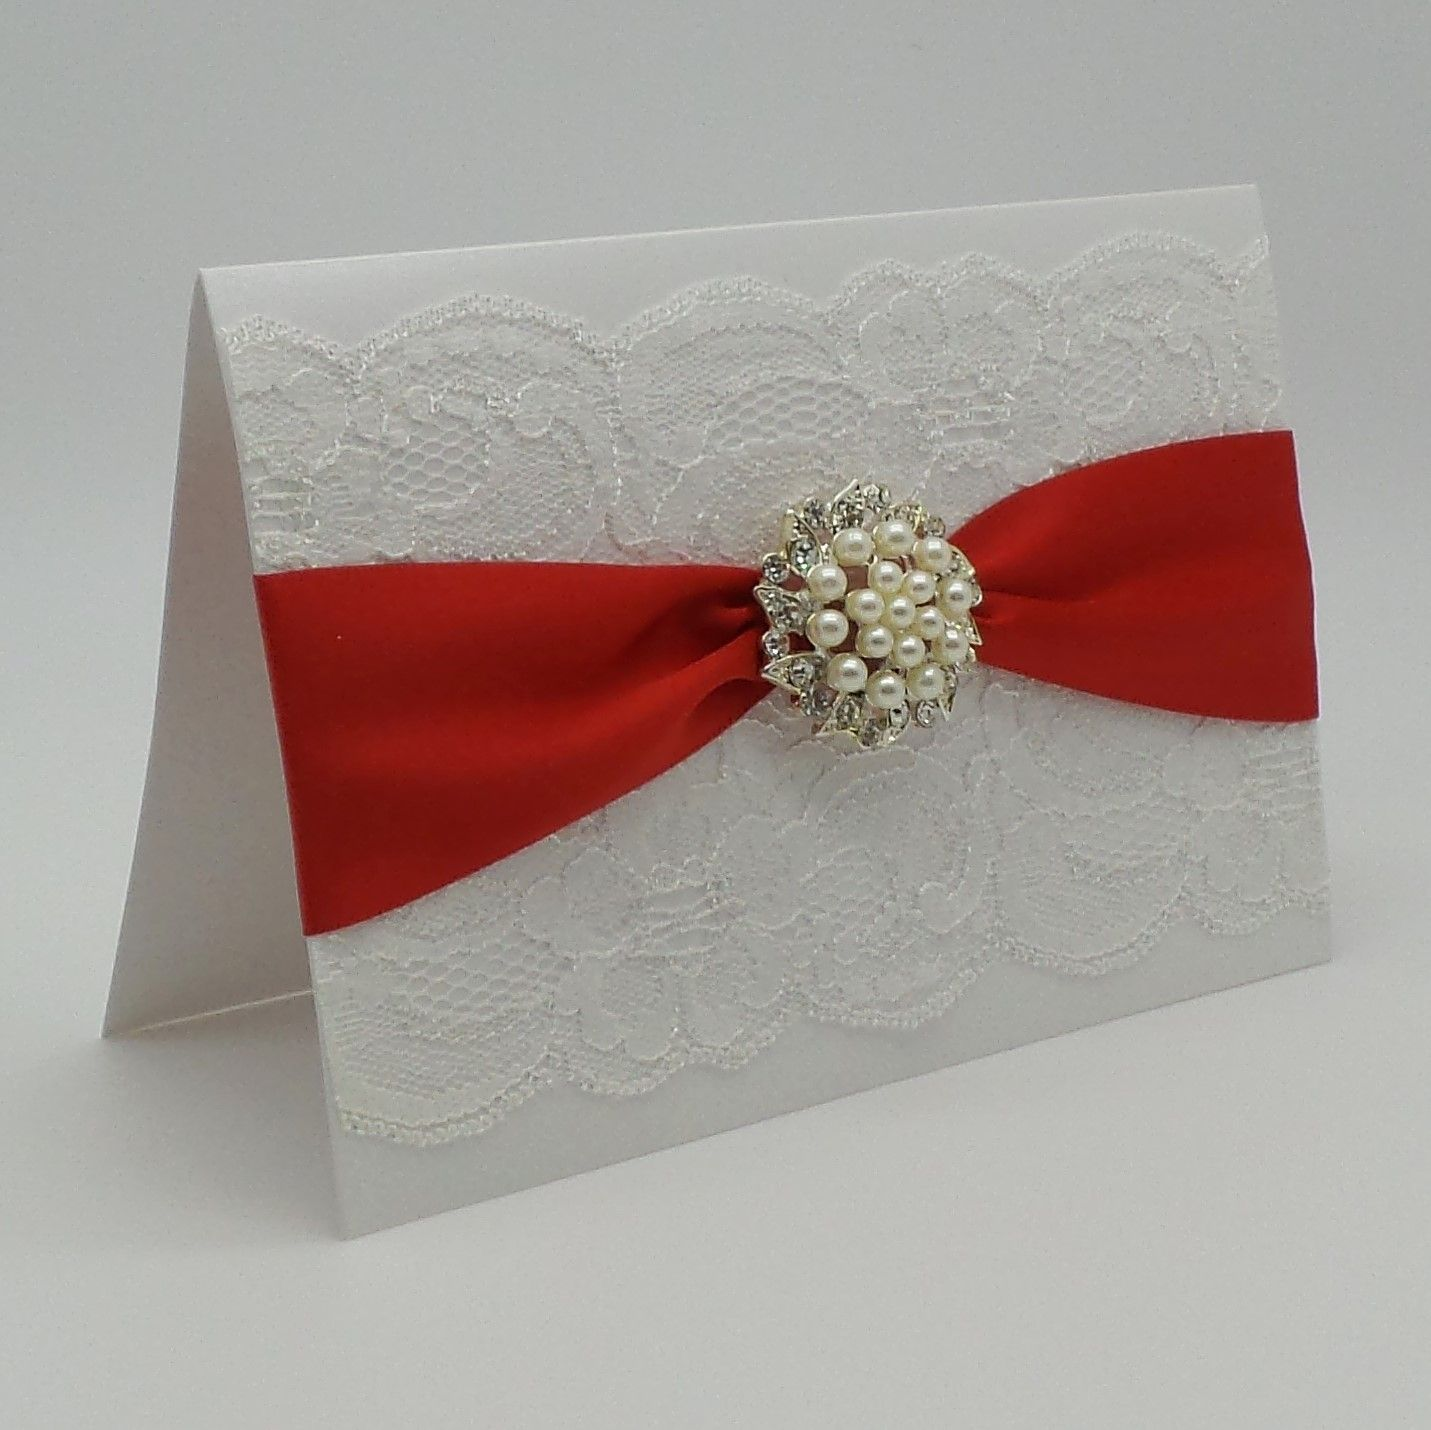 BLACK WHITE IVORY LACE WEDDING INVITATION HANDCRAFTED LUXURY CARD ...